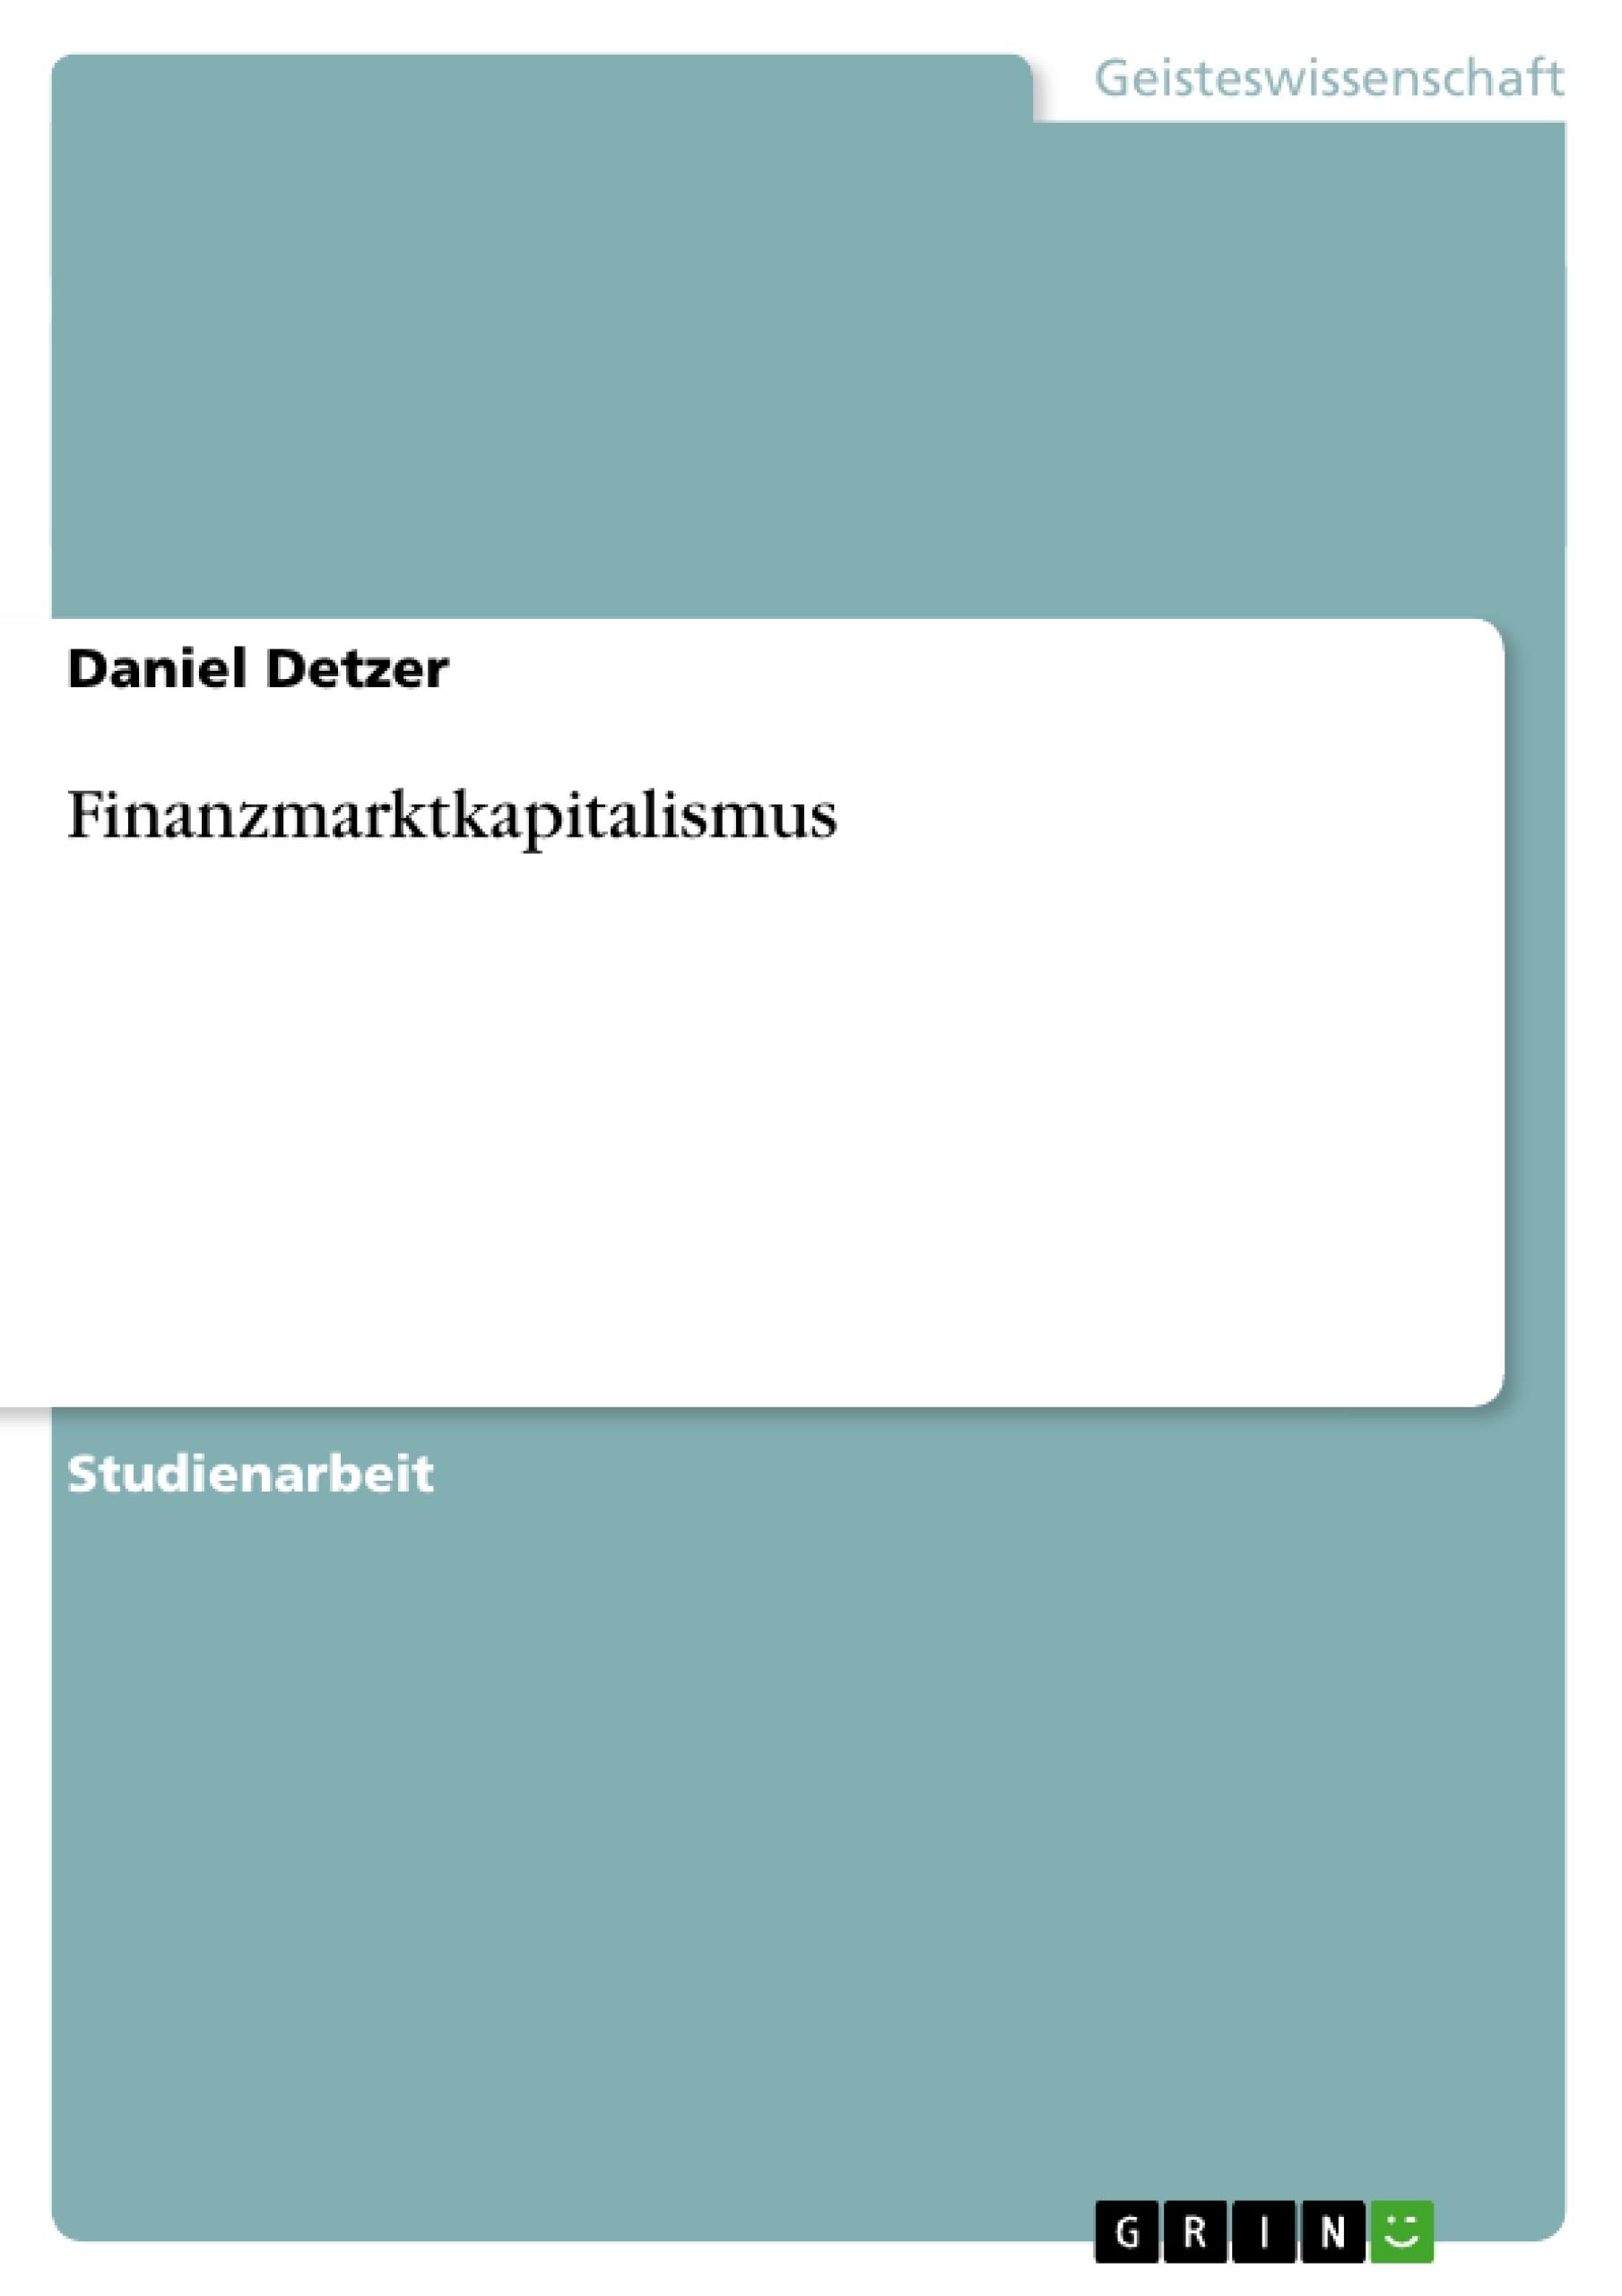 Titel: Finanzmarktkapitalismus